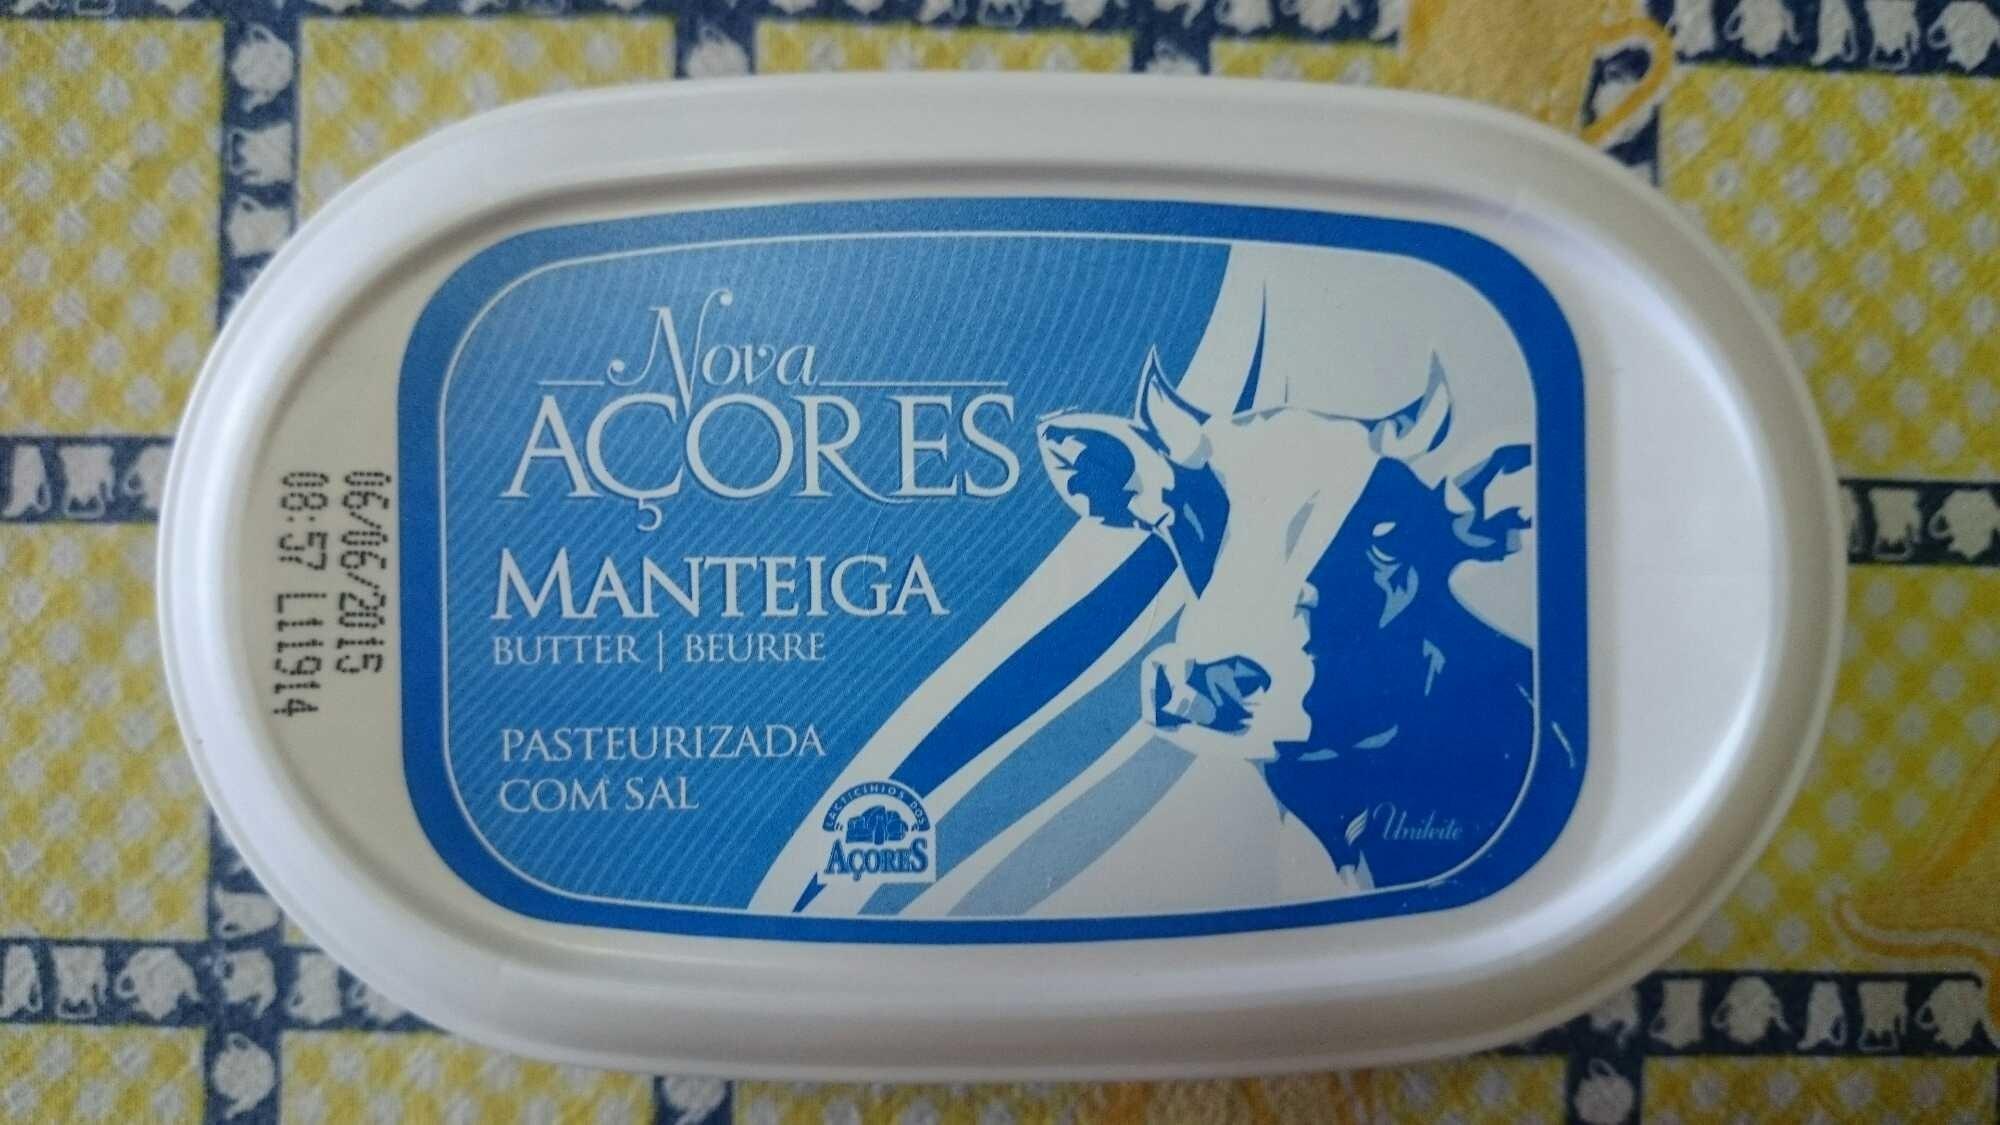 Manteiga - Product